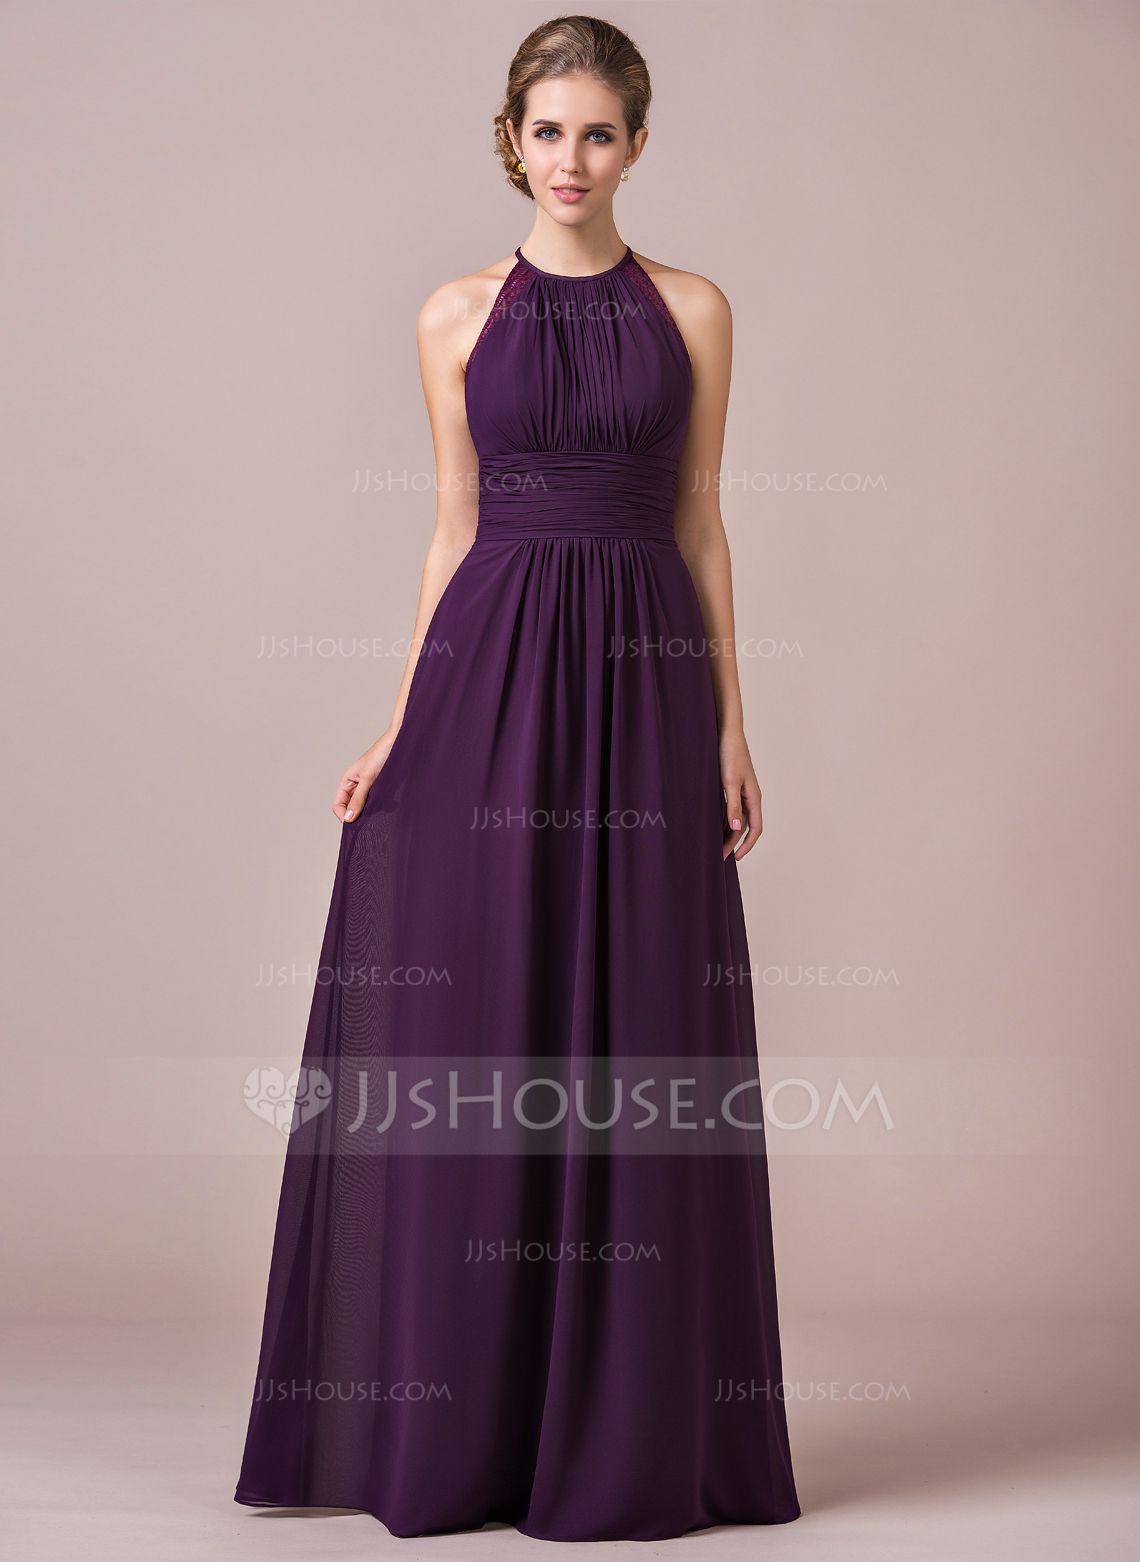 A lineprincess halter floor length chiffon bridesmaid dress with a lineprincess halter floor length chiffon bridesmaid dress with ruffle lace ombrellifo Images